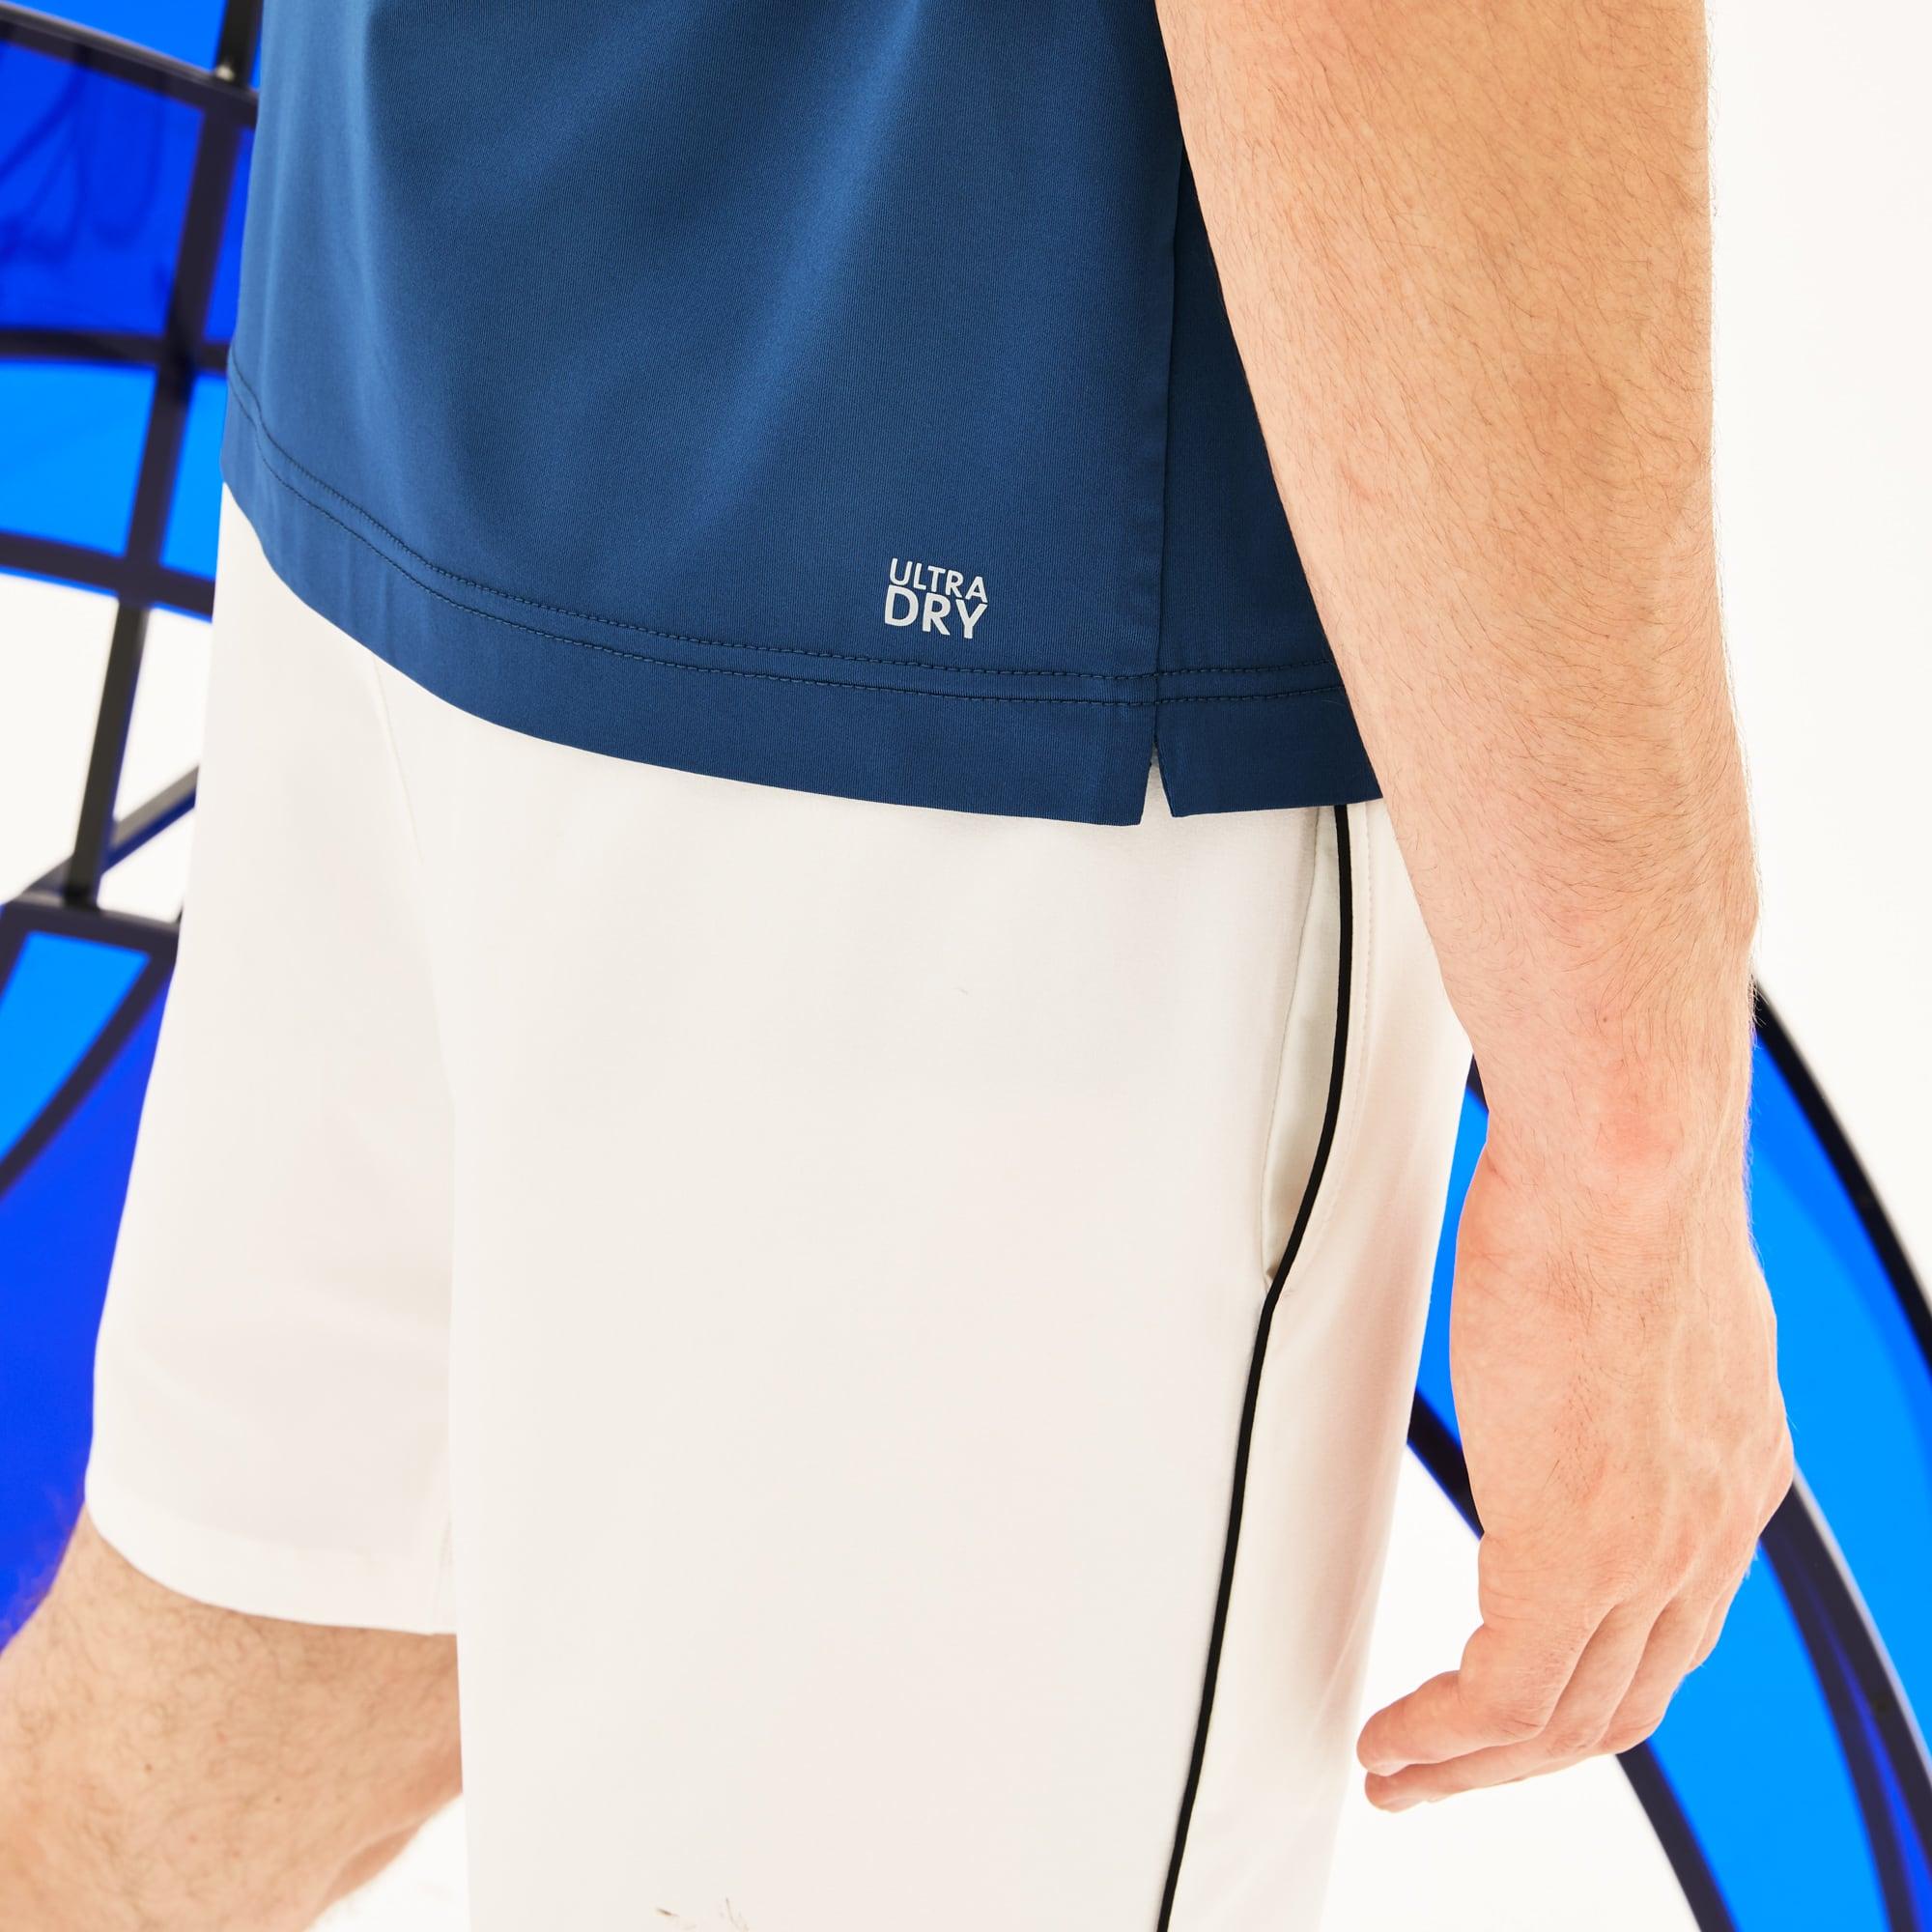 Lacoste - Herren-Poloshirt aus Stretch-Jersey LACOSTE SPORT NOVAK DJOKOVIC - 7